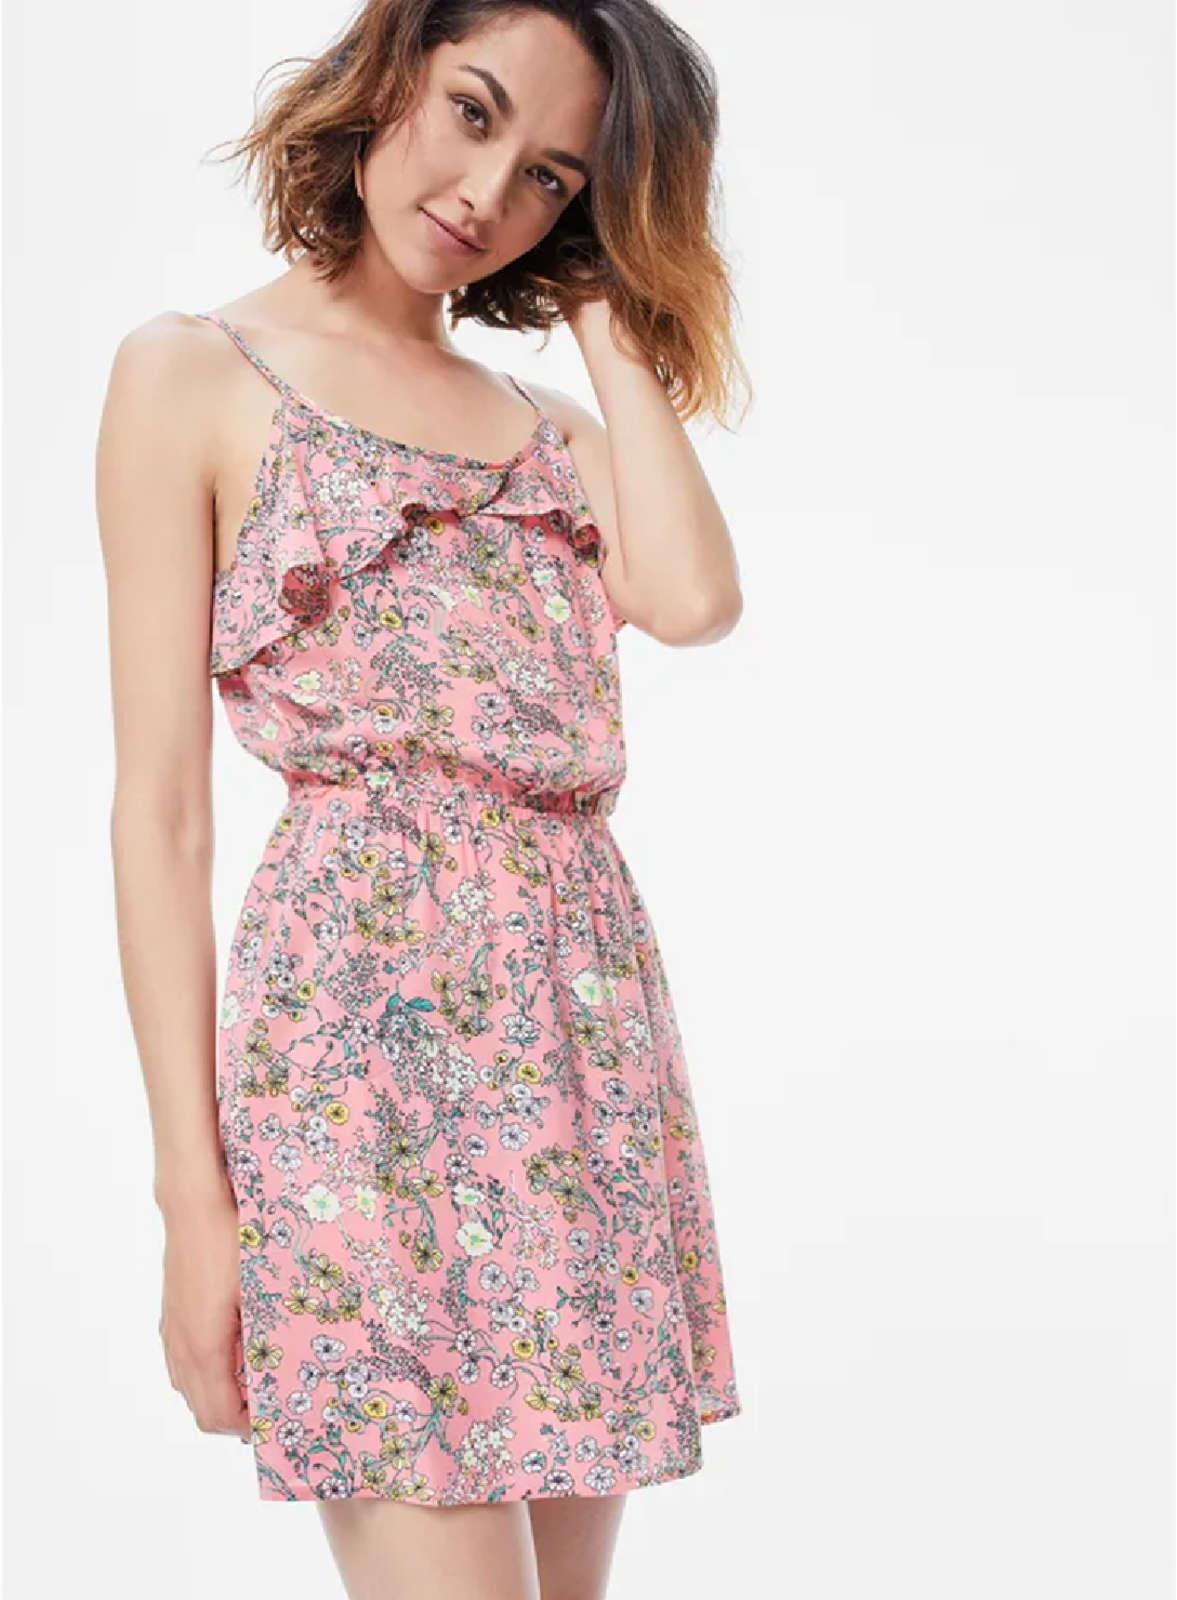 Donde comprar vestidos largos bogota